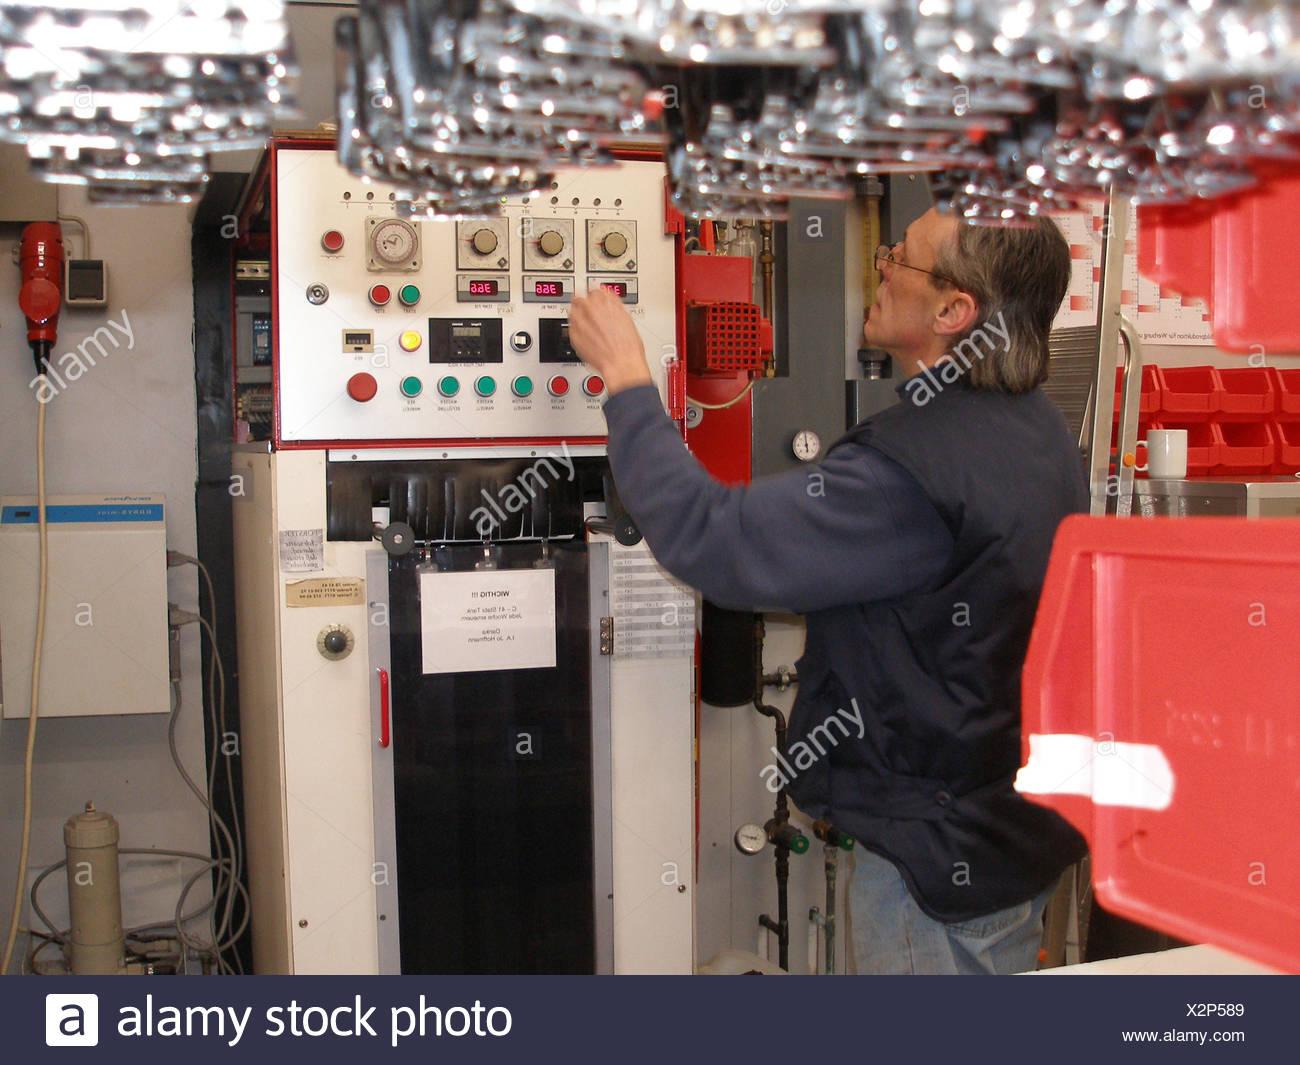 Insalubrious Job Stock Photos Images Alamy Control Panel Wiring Jobs Check Engine Image